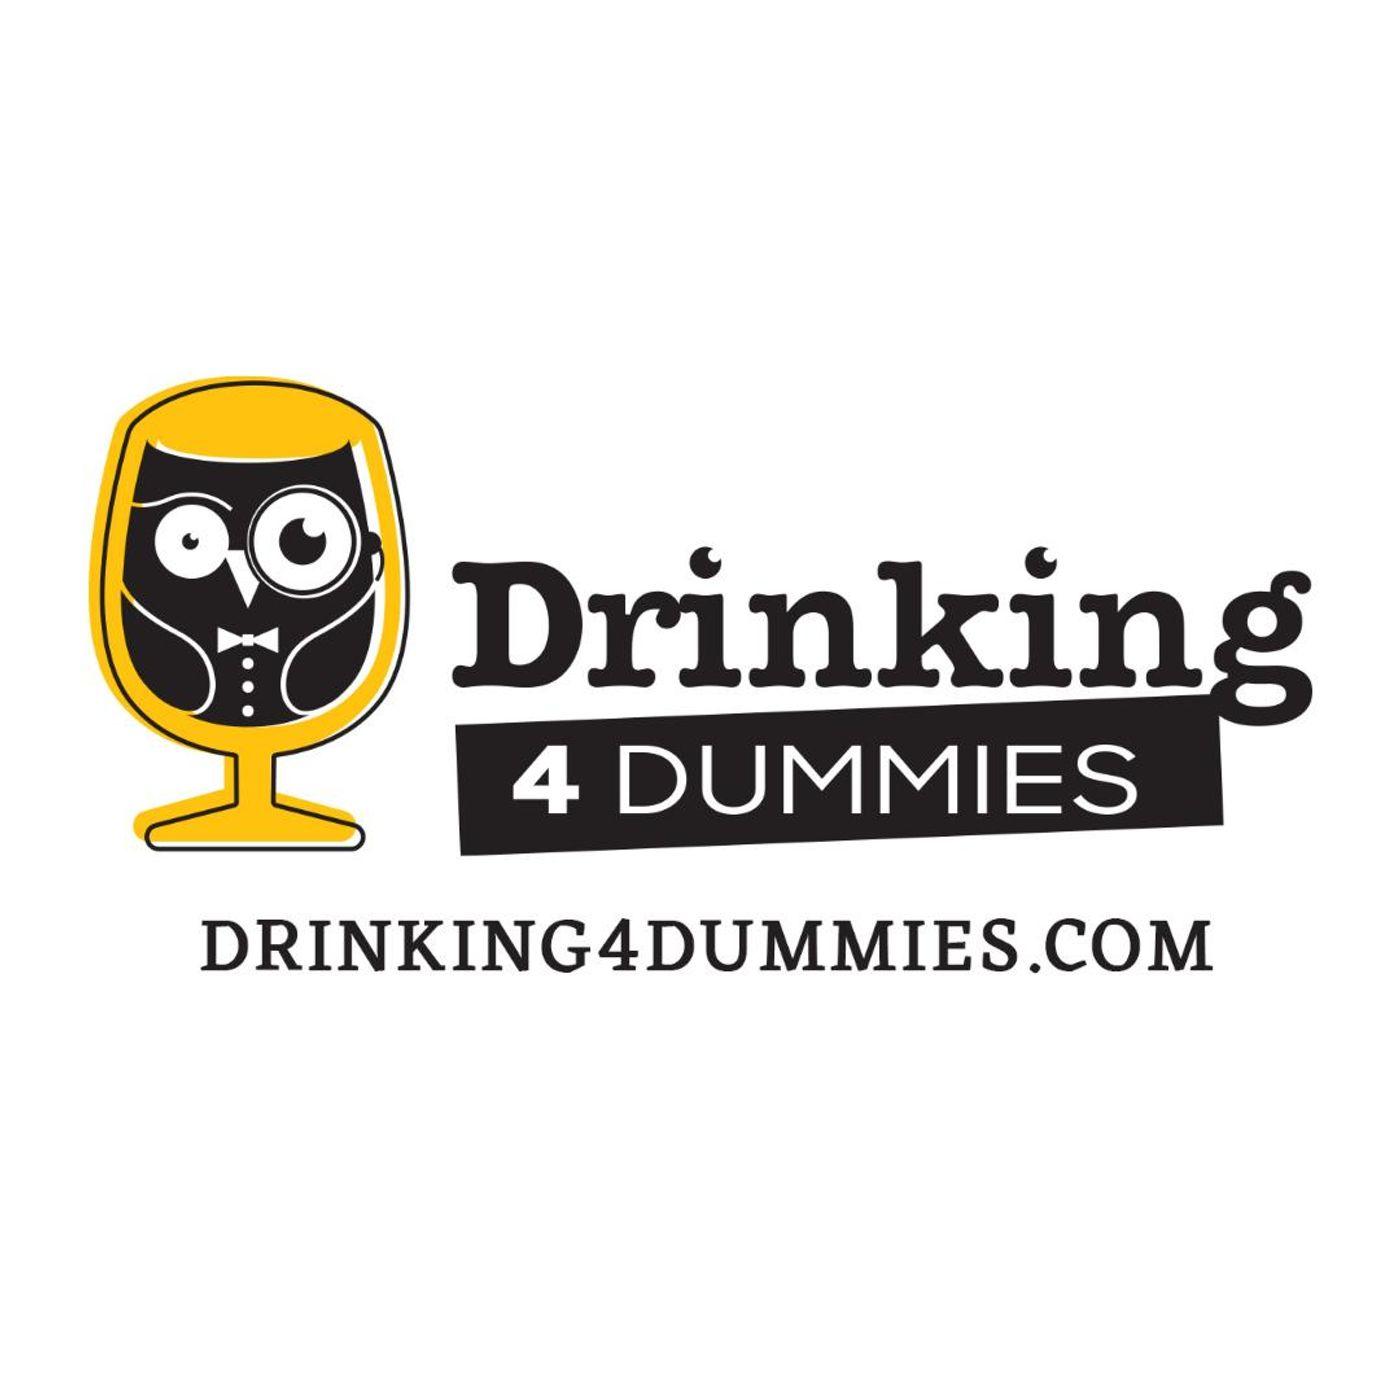 Drinking 4 Dummies Promo